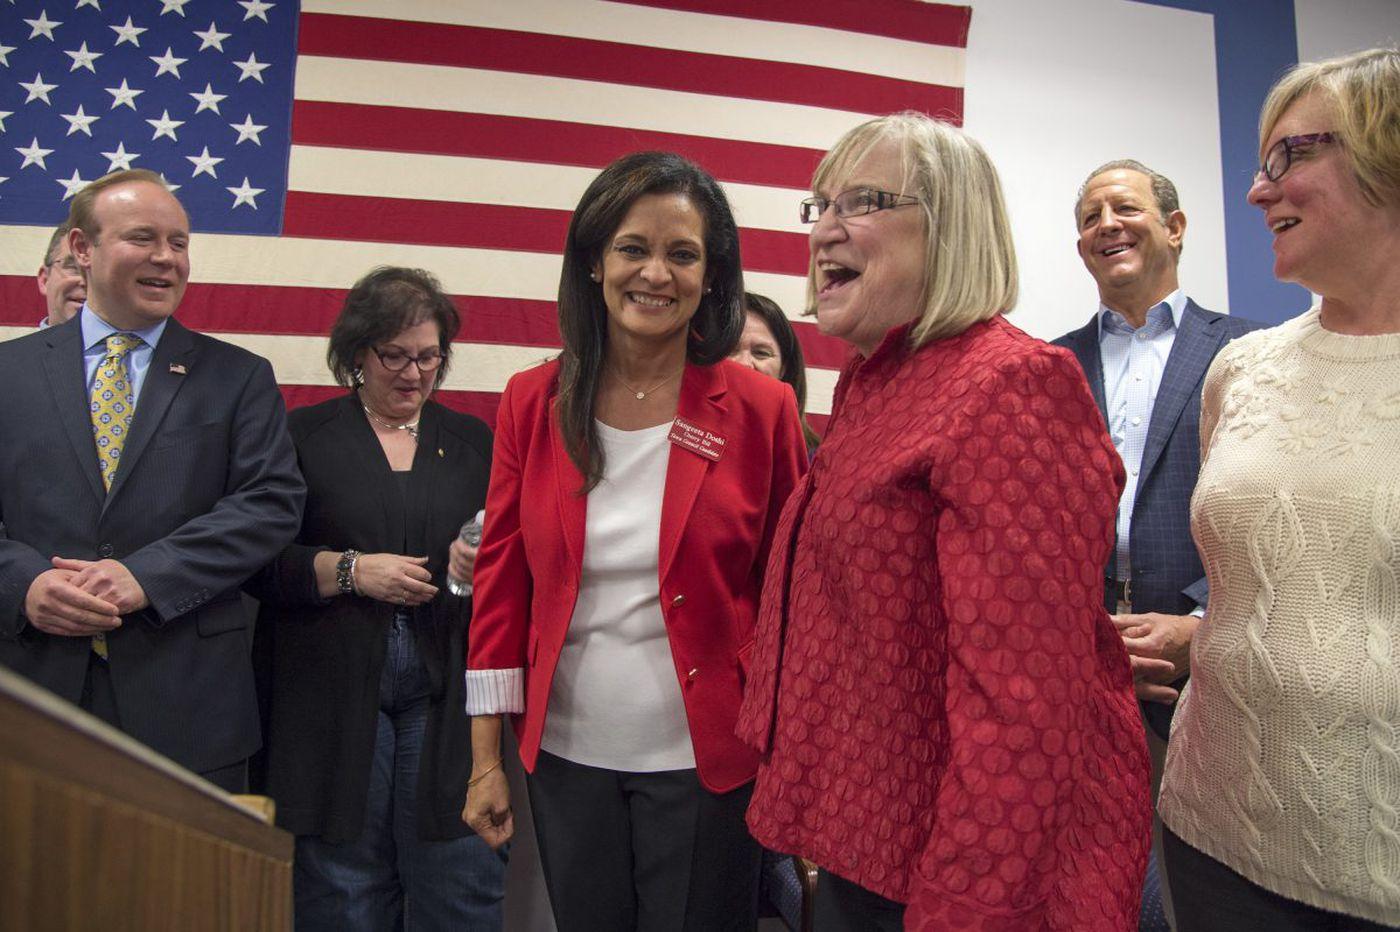 No Trump bump for challengers in Camden County, where primary politics were all local